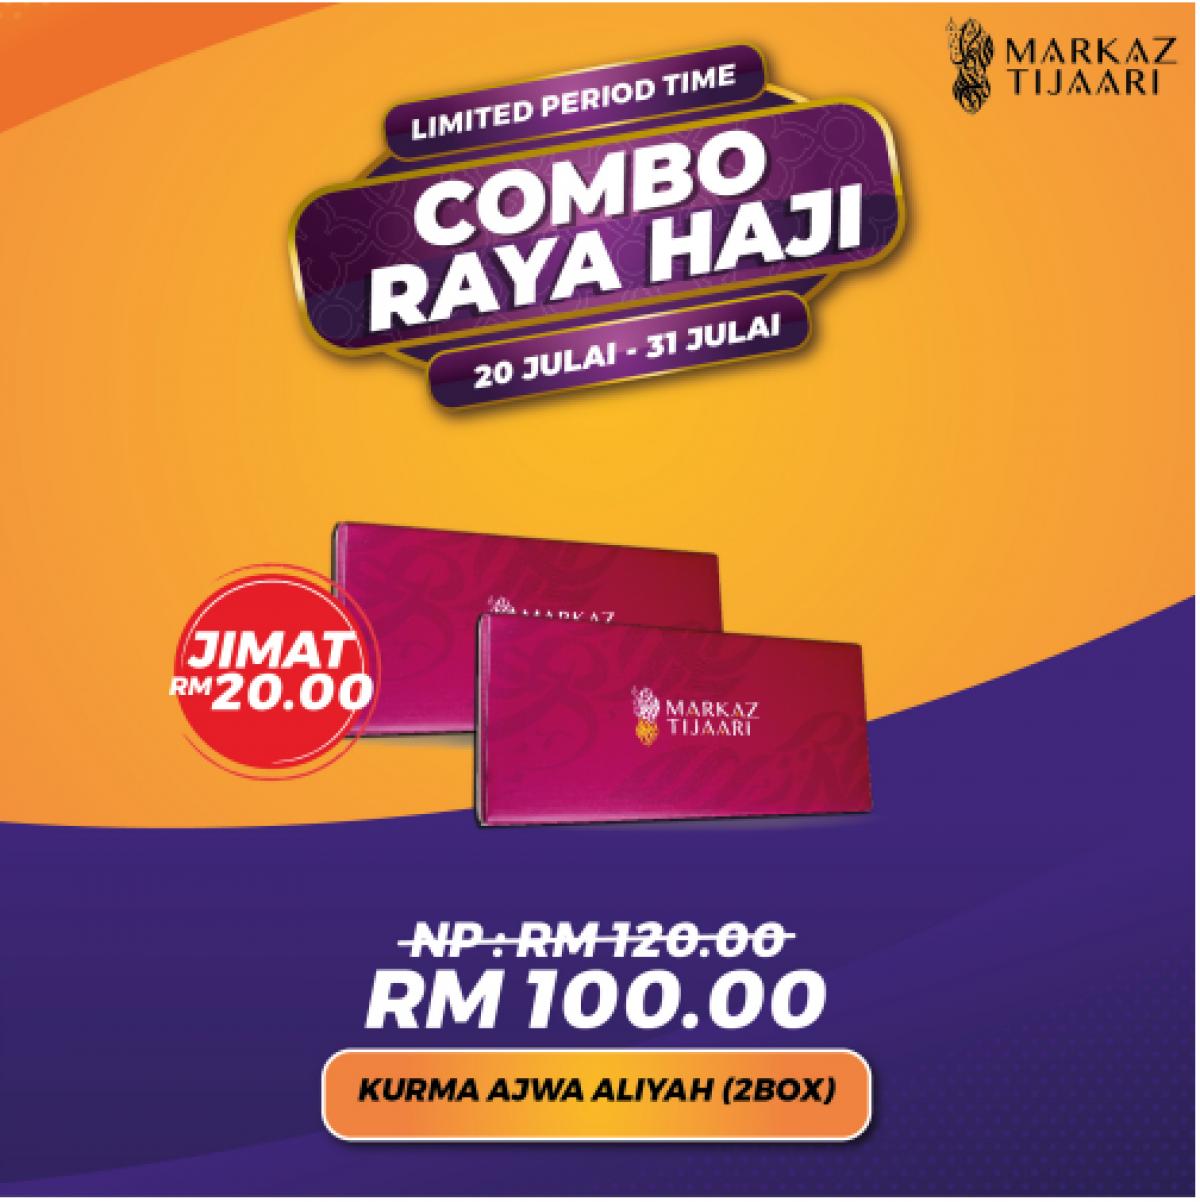 2 Box Kurma Ajwa Aliyah Combo Raya Haji - MARKAZ TIJAARI